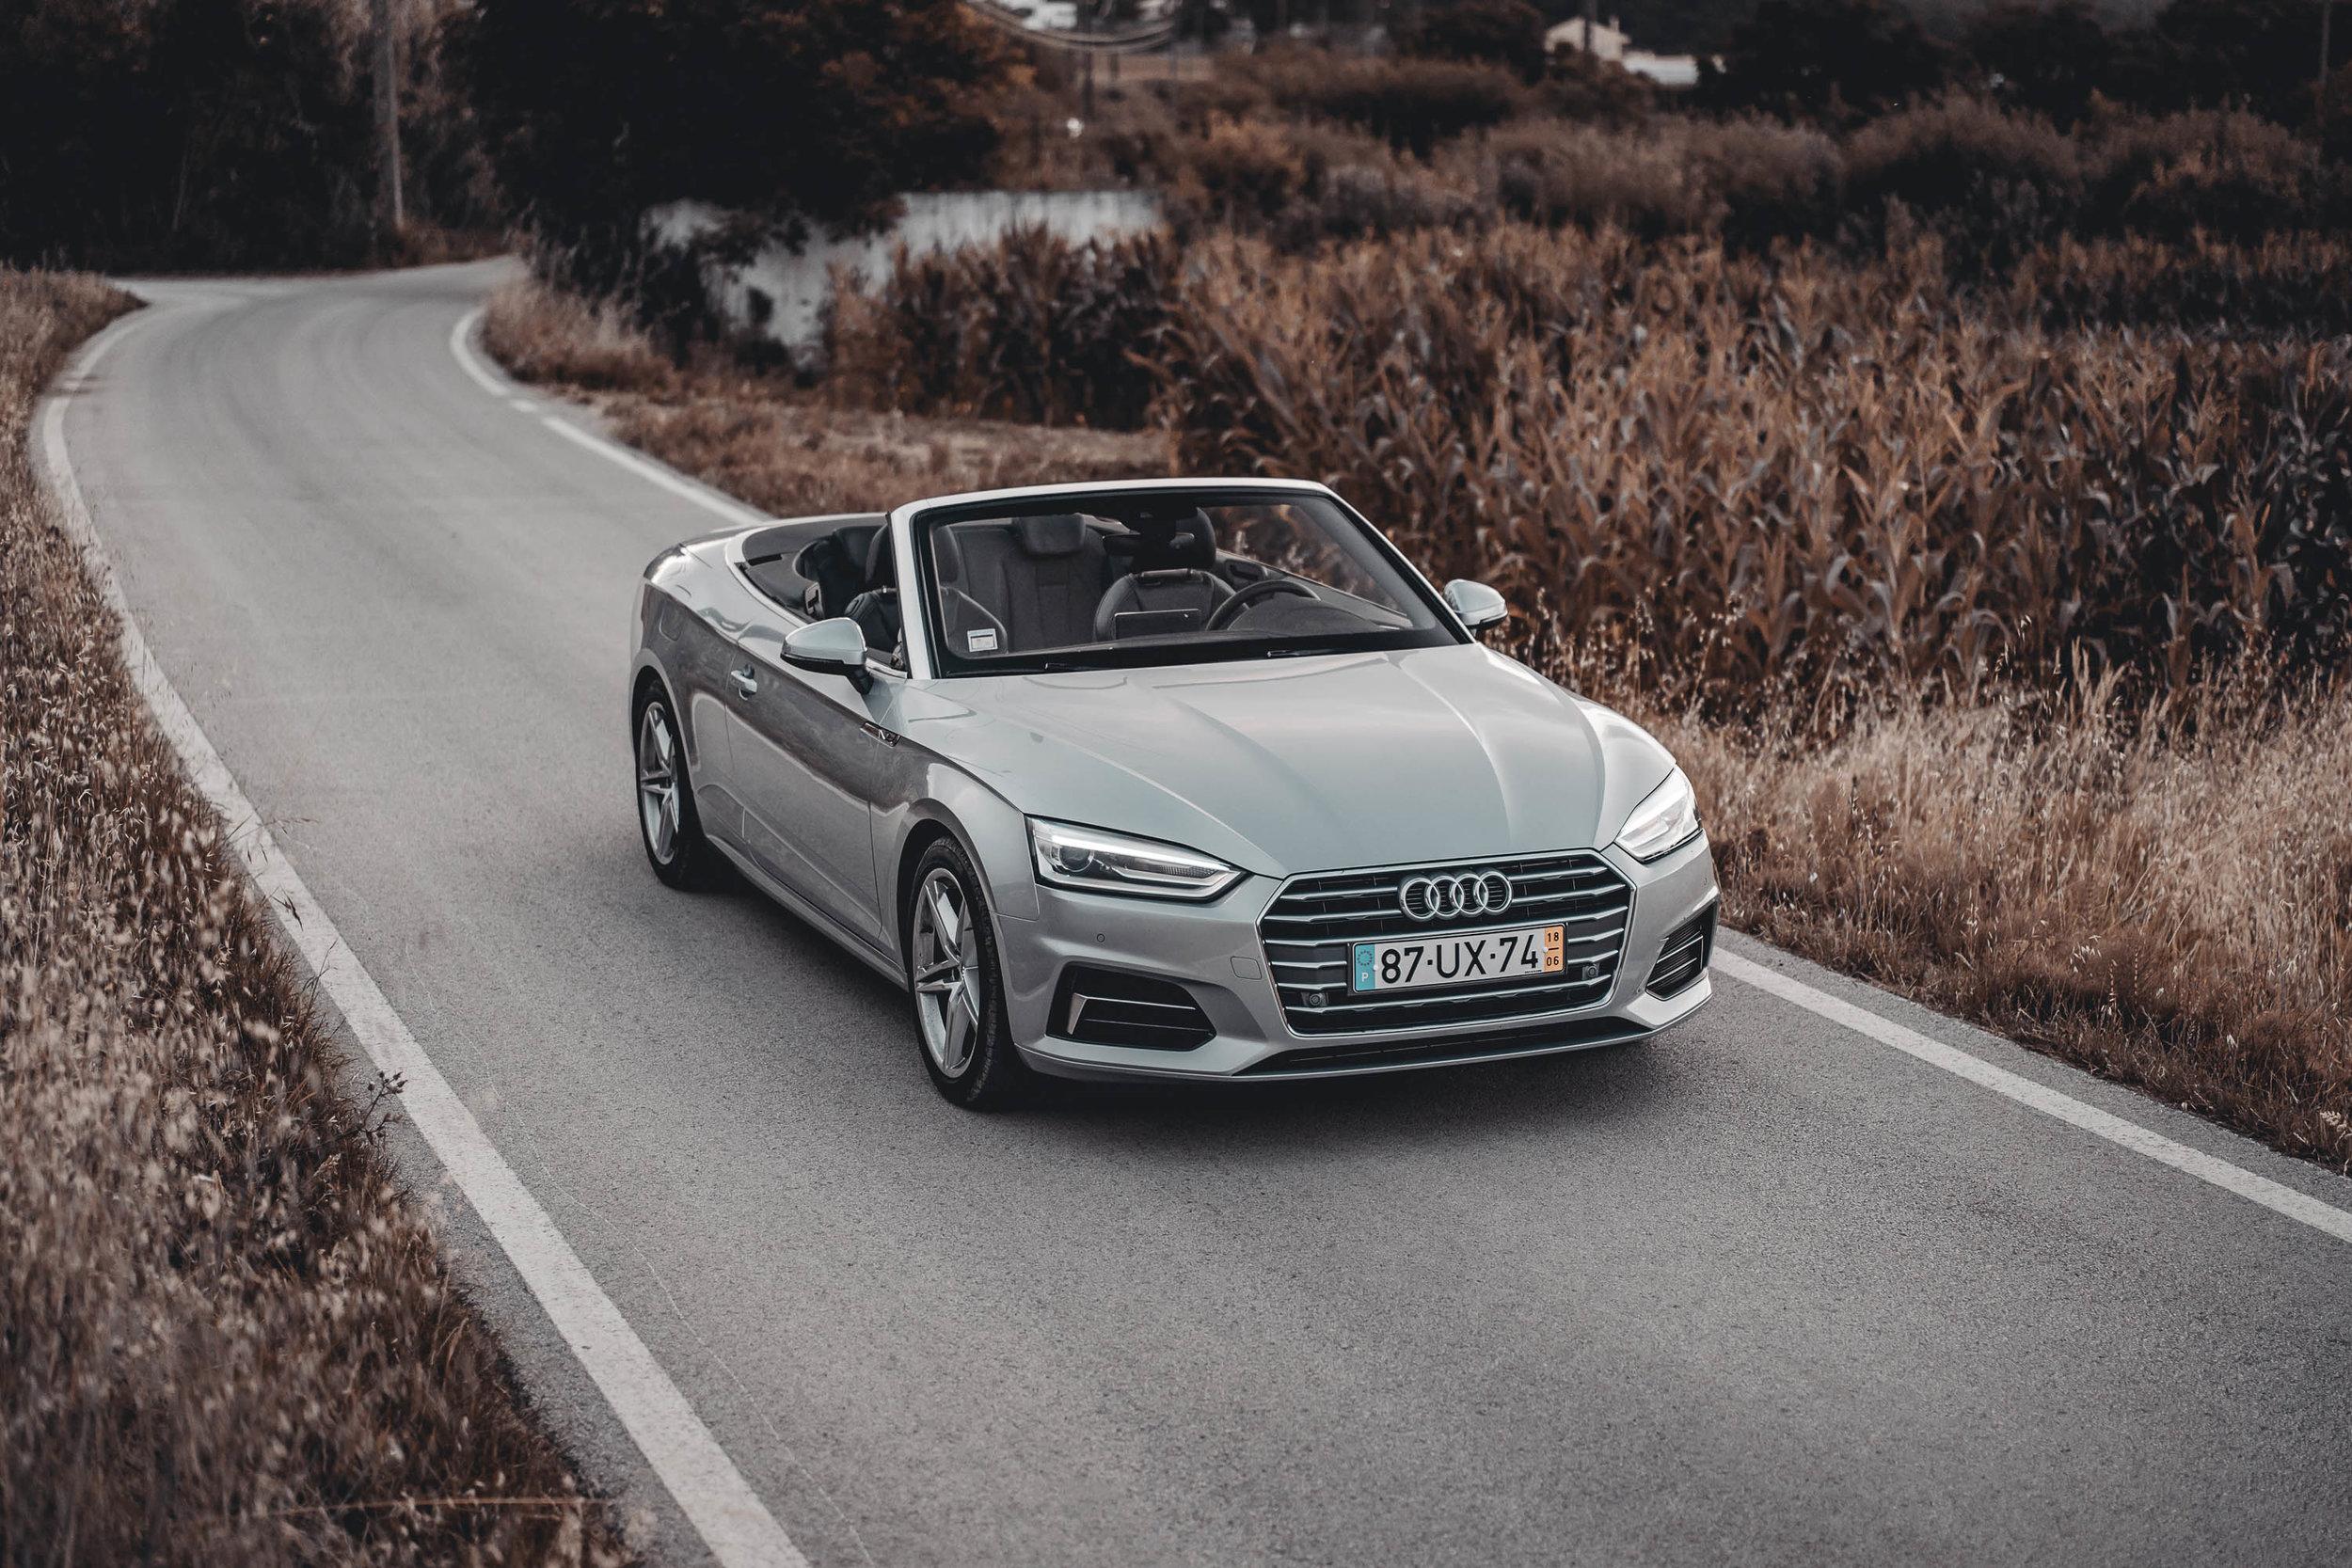 Maximilian_Otto_Audi_A5_Cabriolet_Portugal_17_WEB.jpg